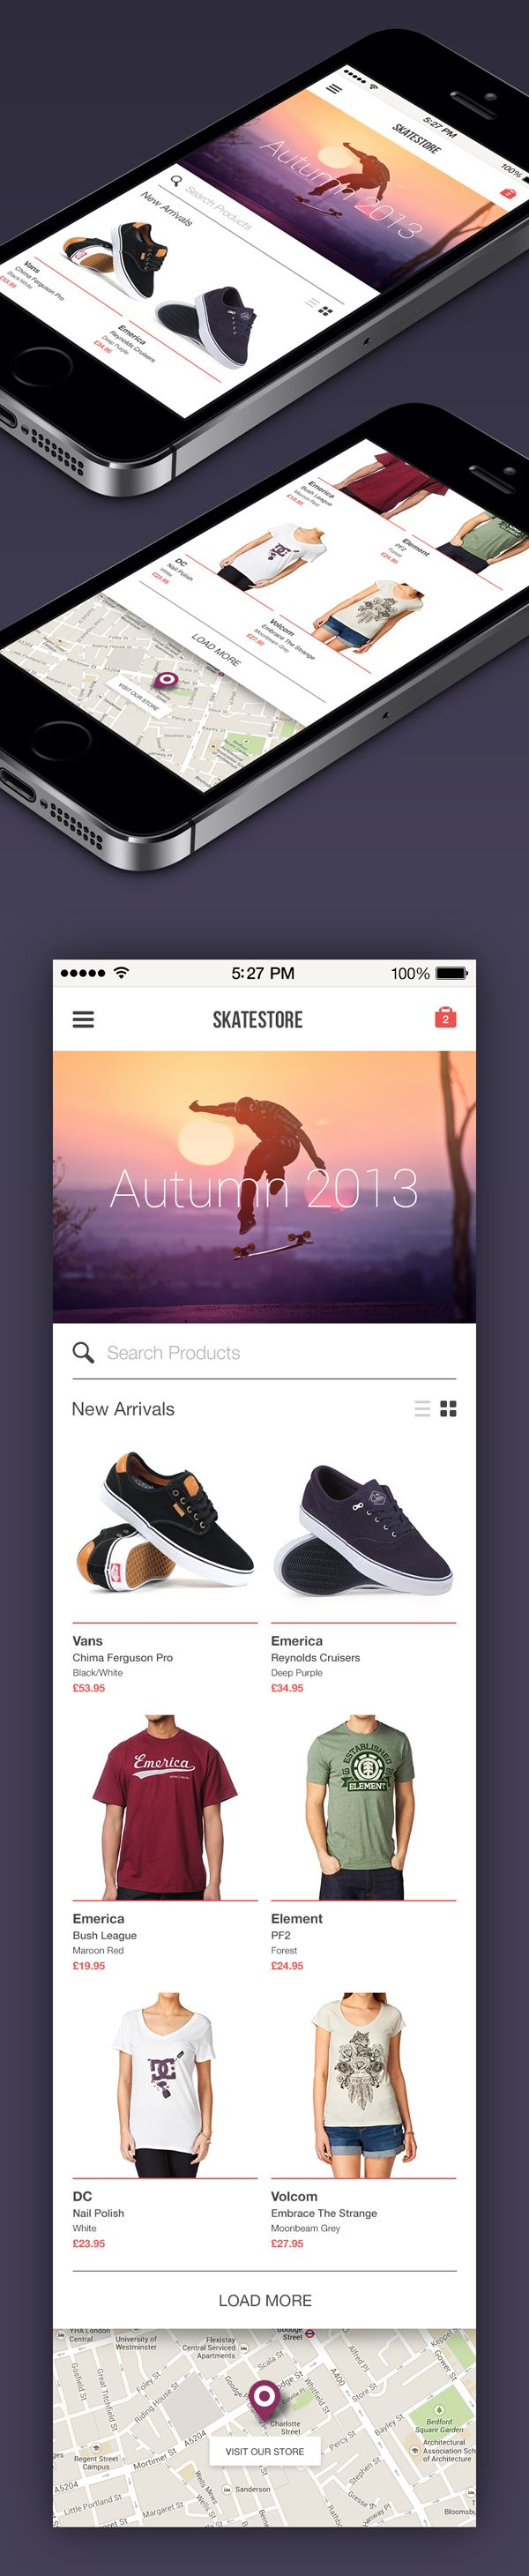 Skatestore on App Design Served